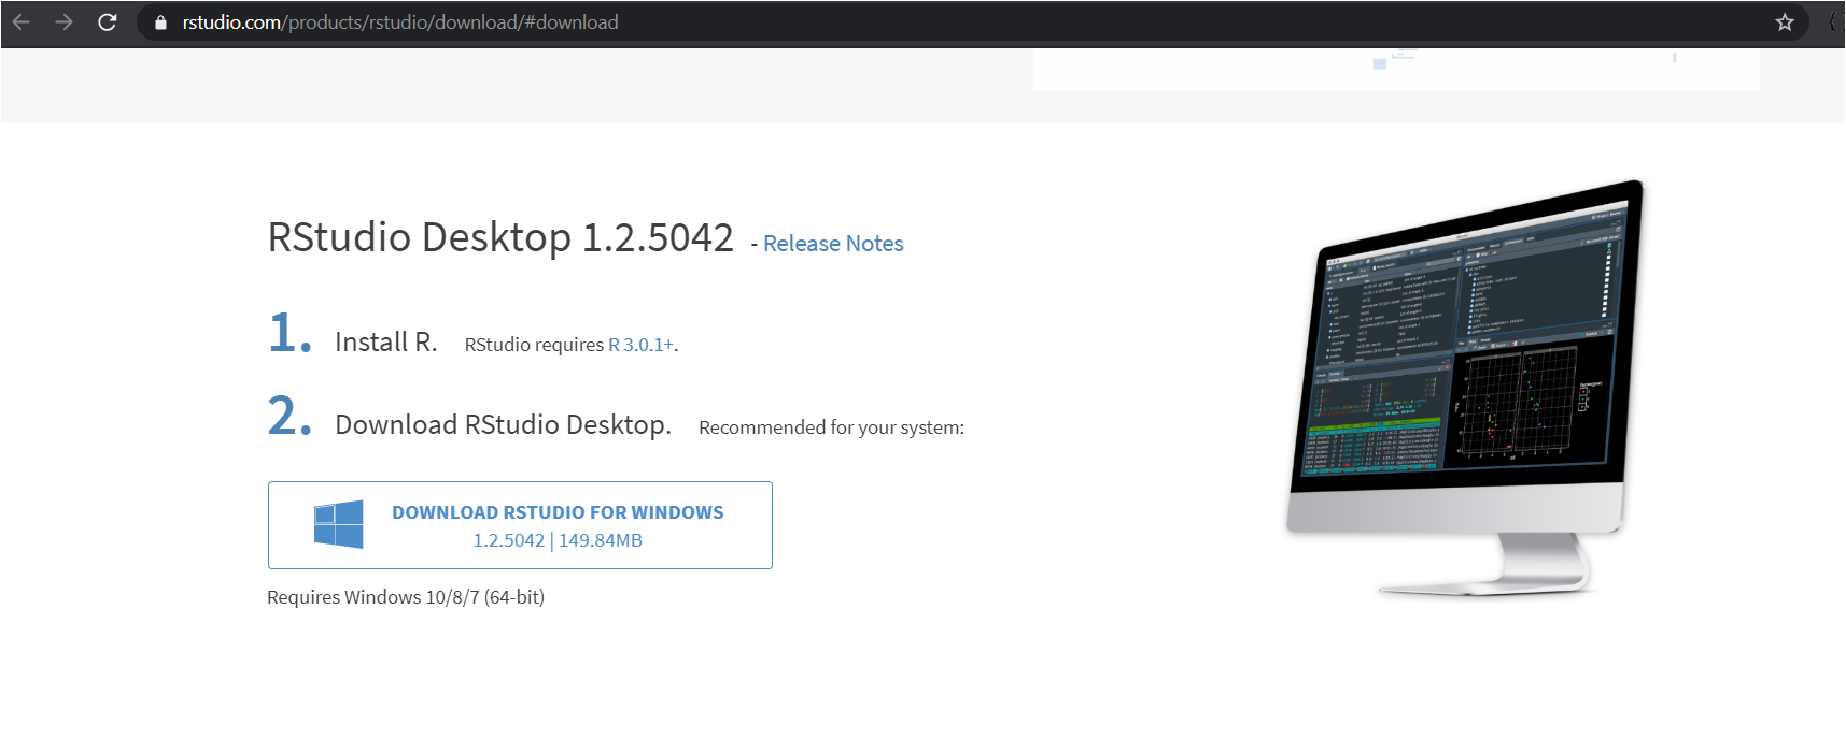 Downloading R Studio for Windows.